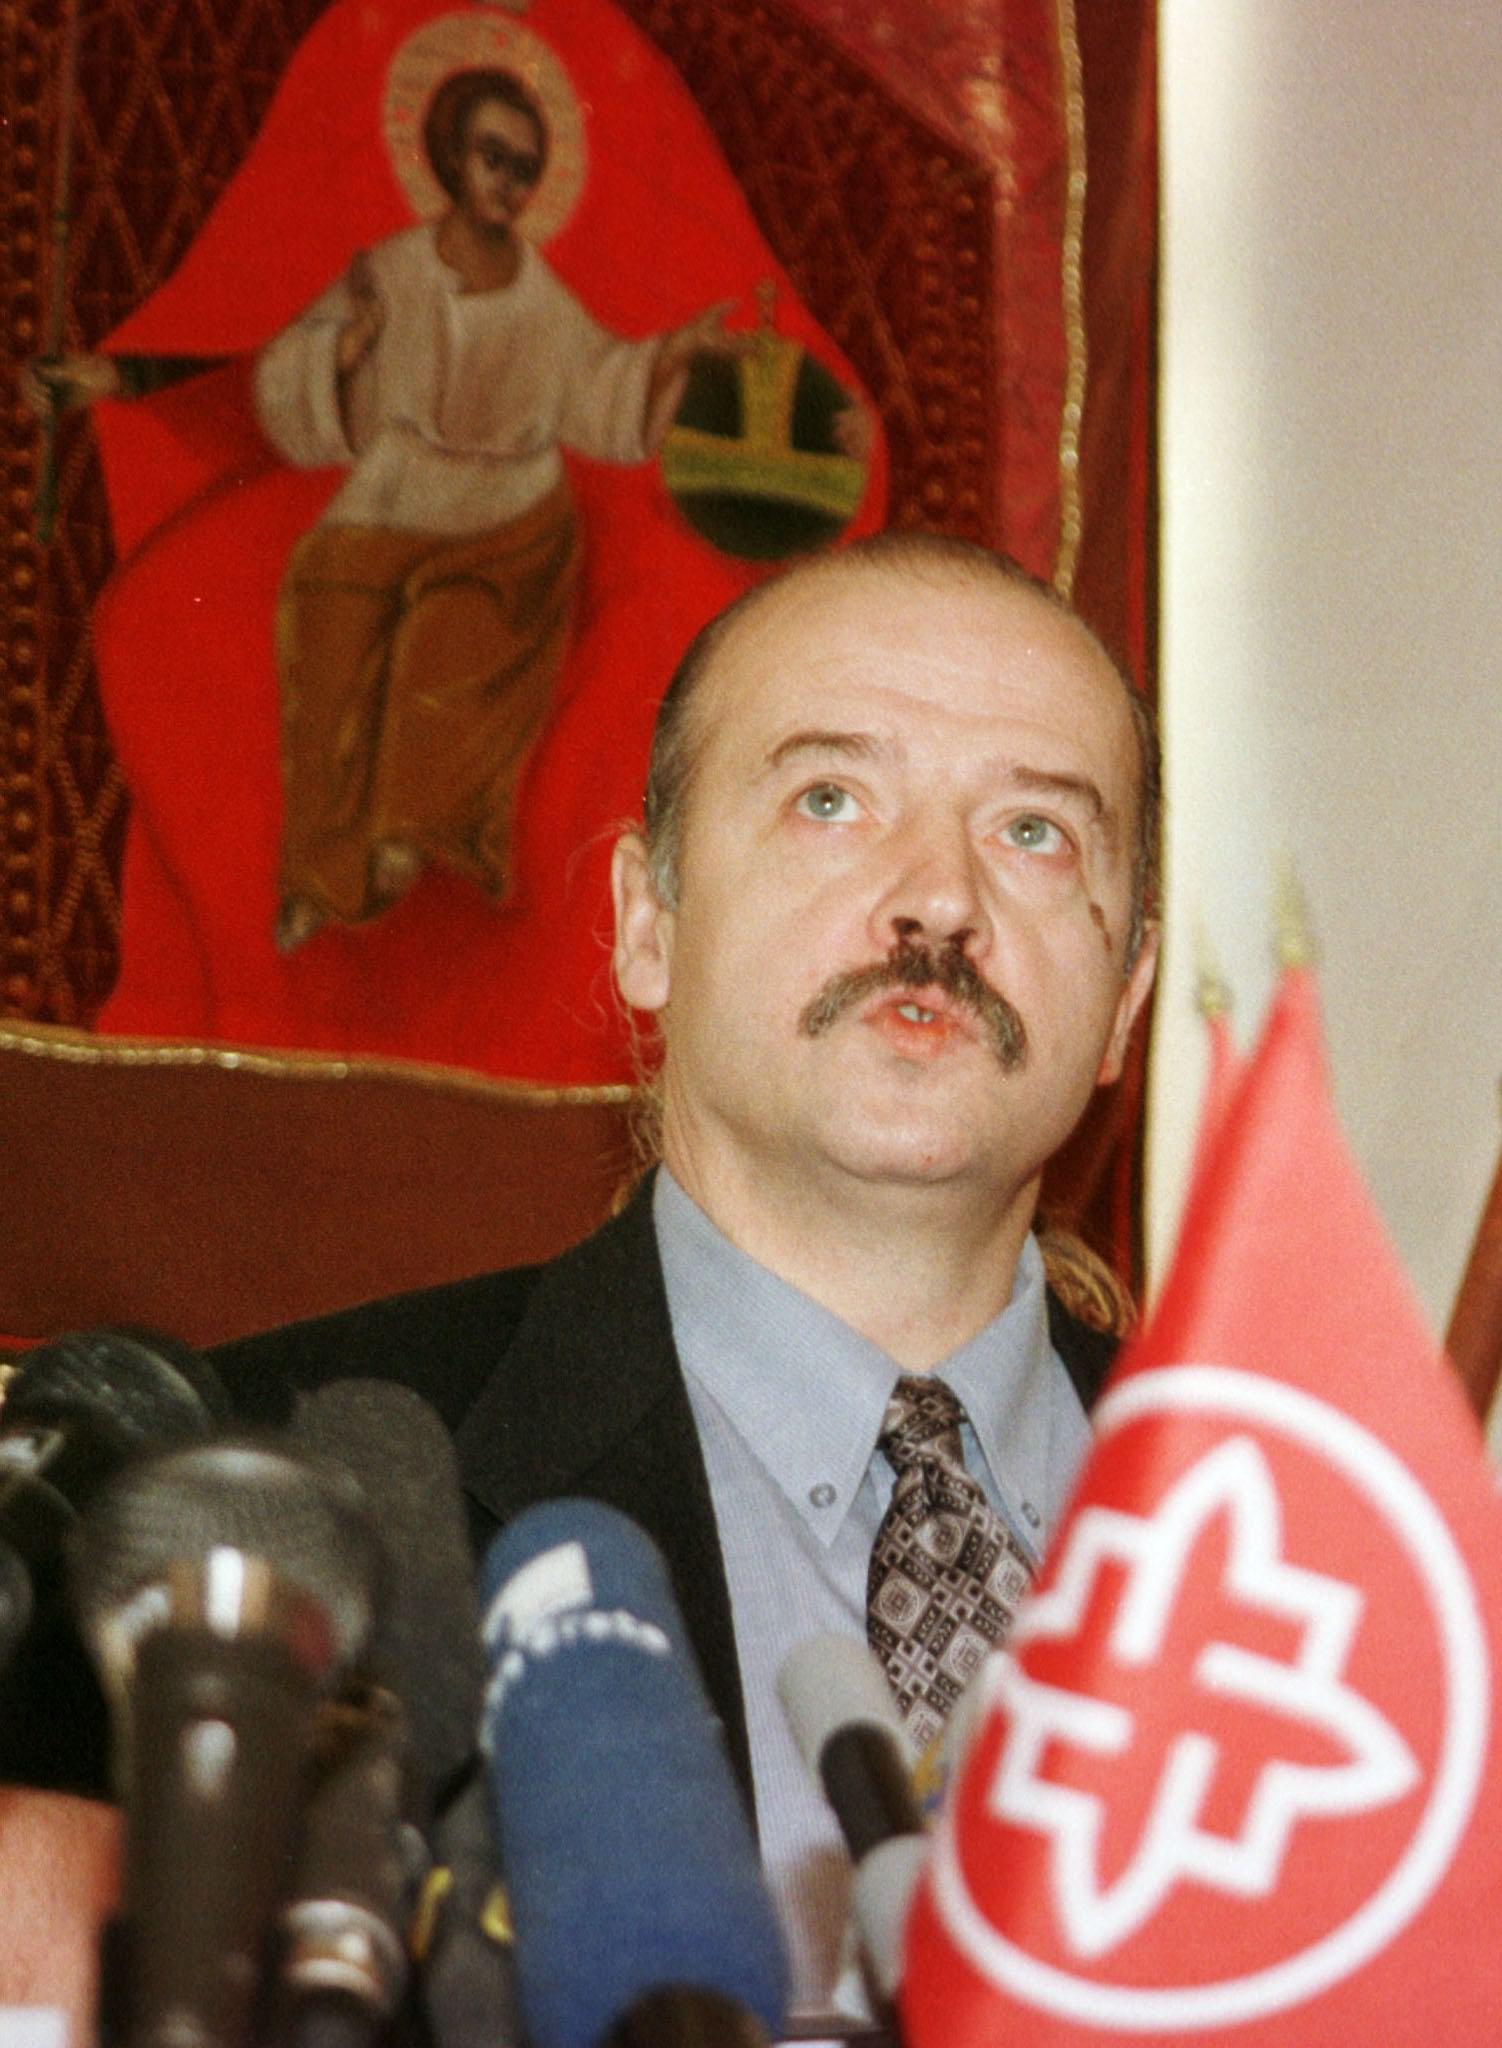 Ukraine Crisis Who Are the Russian NeoNazi Groups